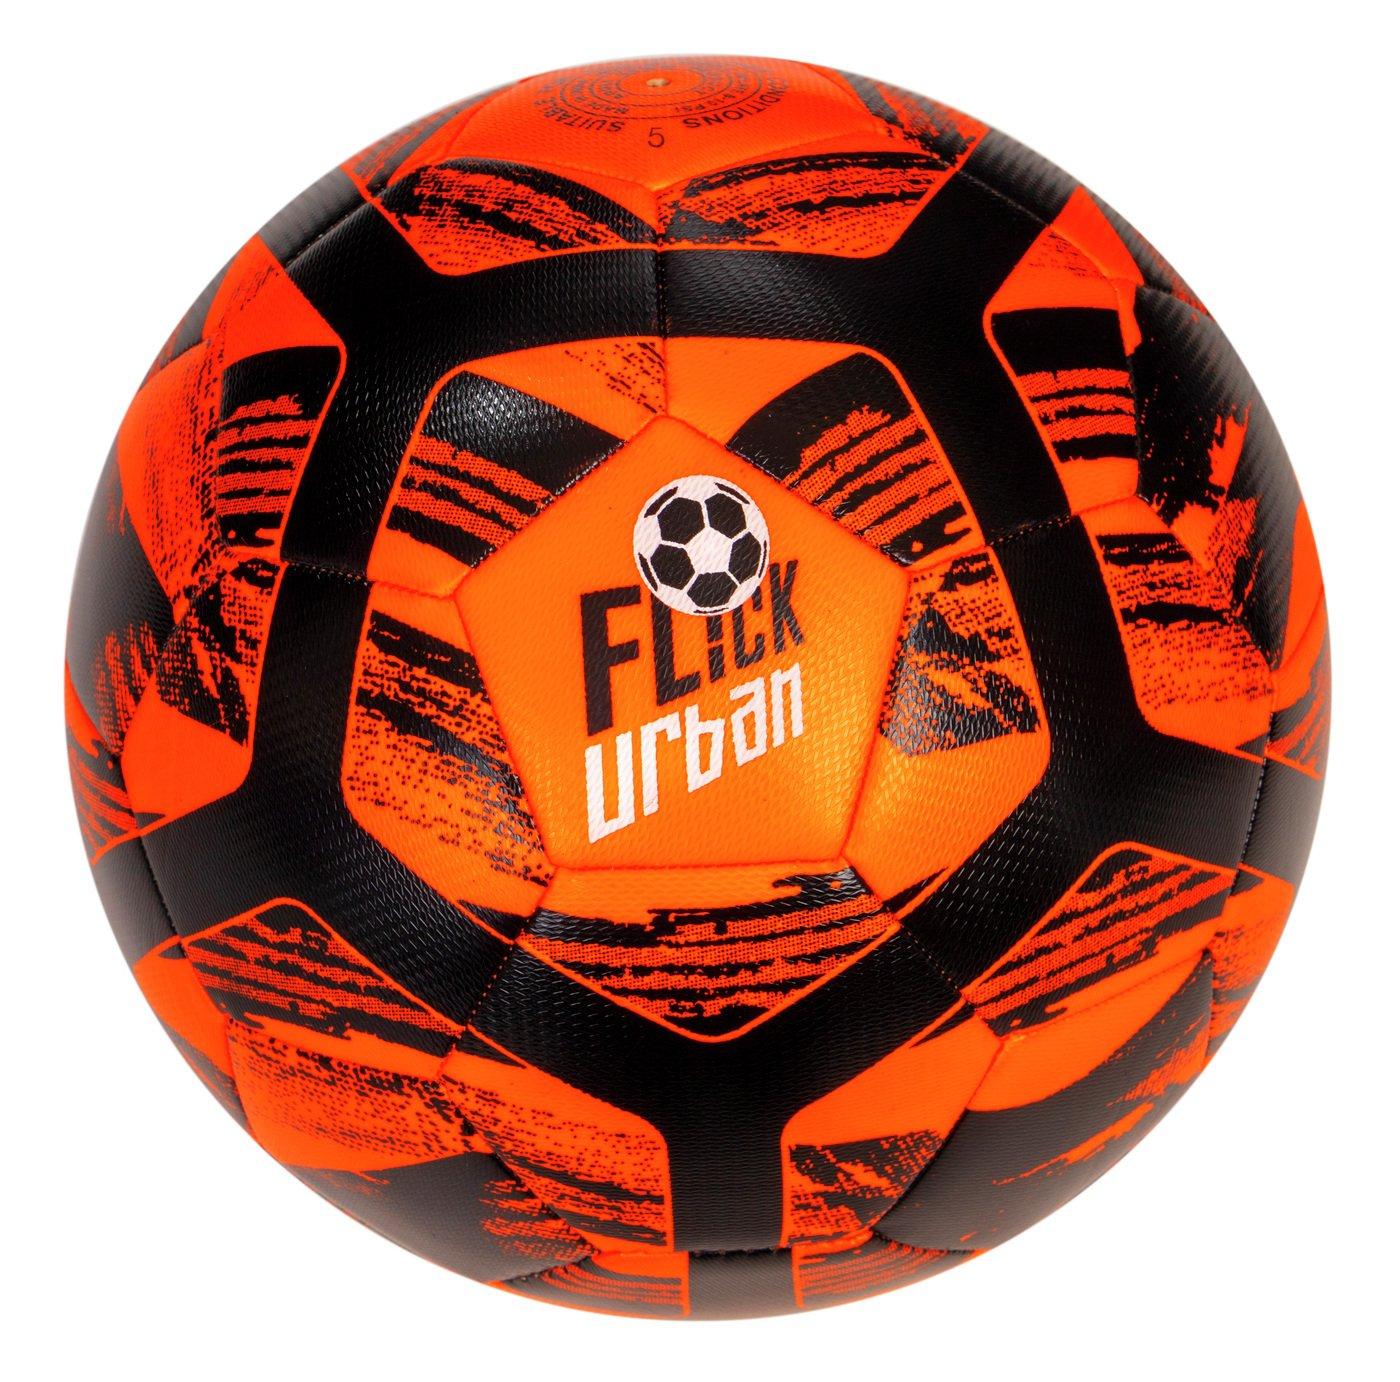 Football Flick Urban Size 5 Football - Orange and Black